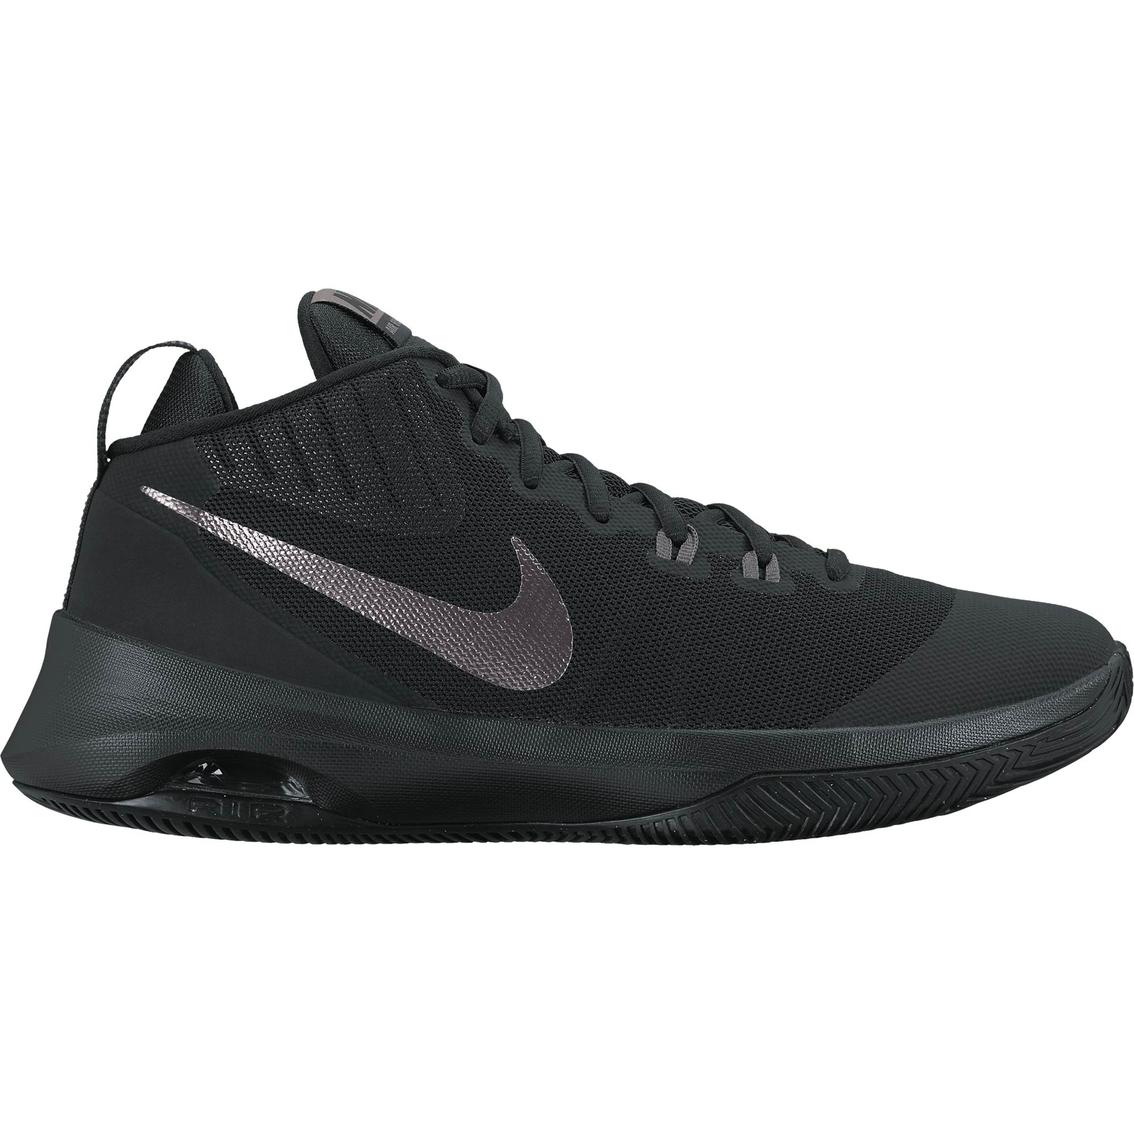 Nike Men s Air Versatile Nubuck Basketball Shoes  9bf32d54b342